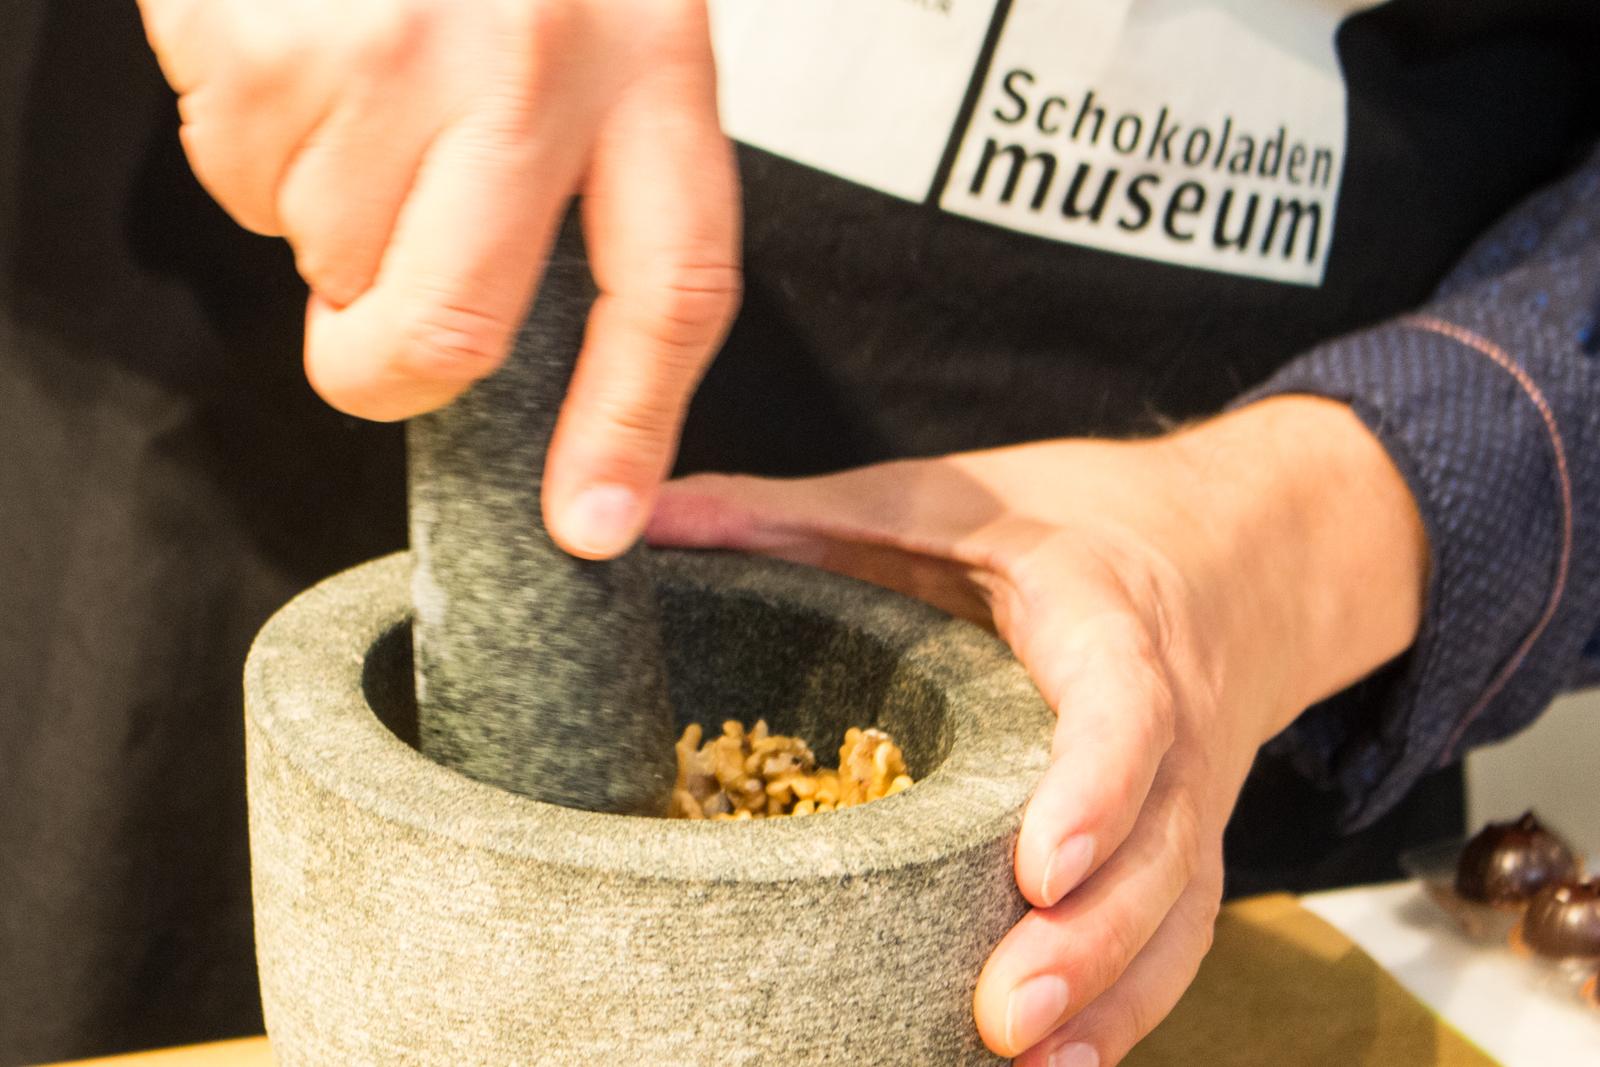 Pralinen, Pralinenkurs, Schokoladenmuseum, Köln, Cologne, Travel, chocolate